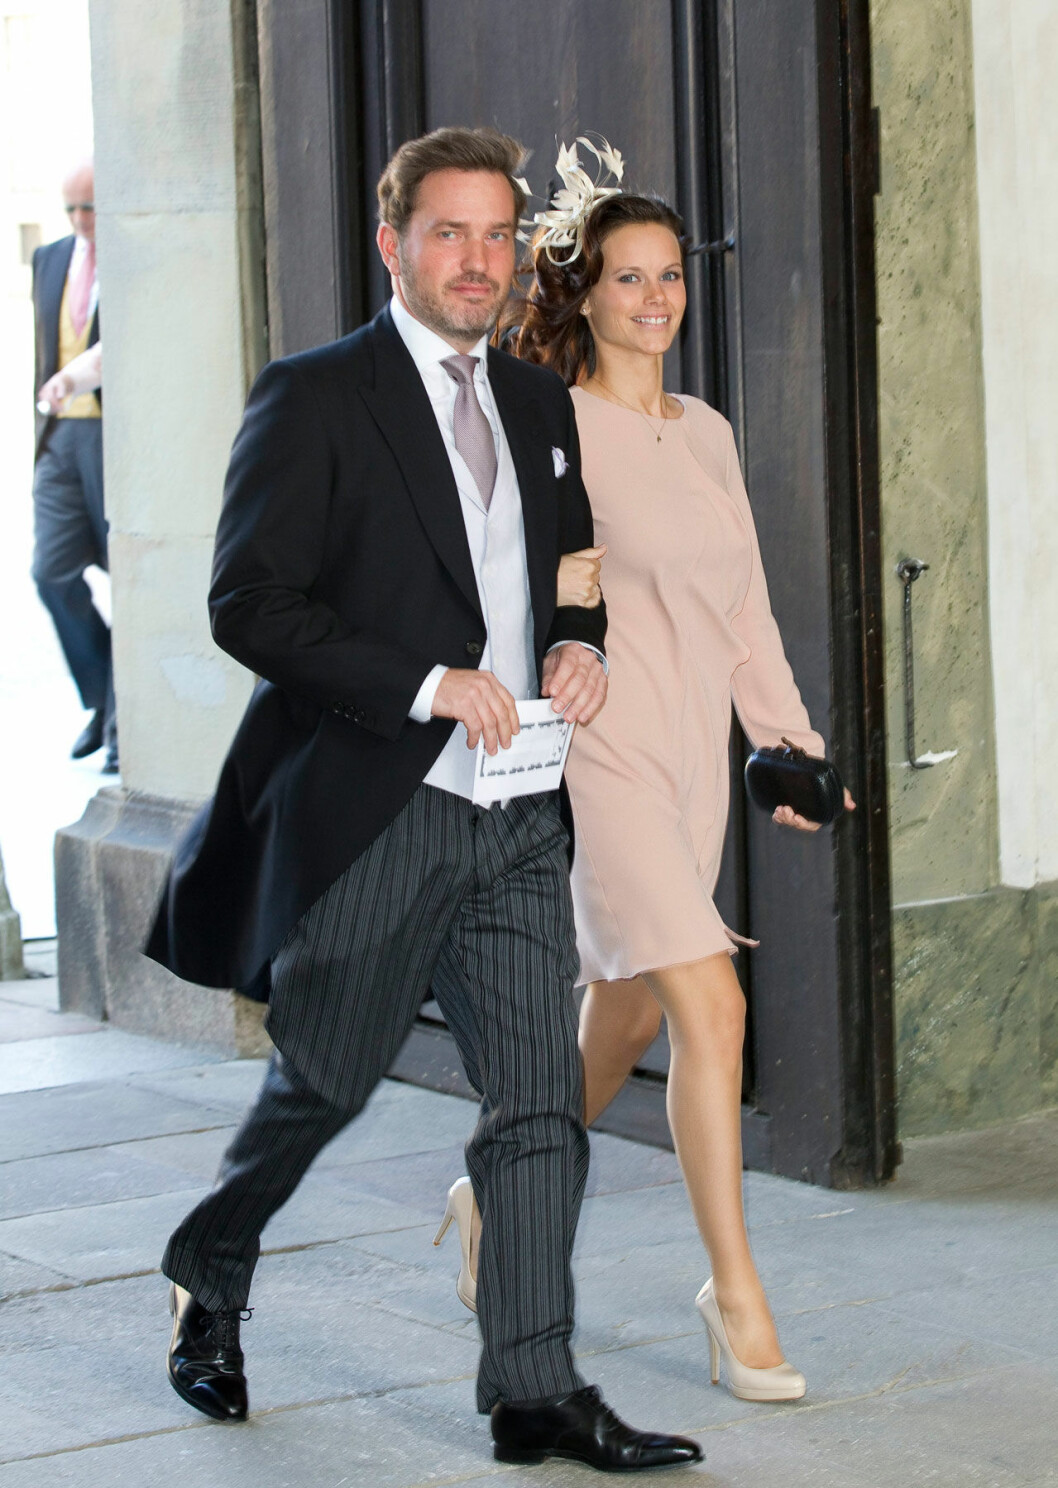 Chris O'Neill och prinsessan Sofia (som då hette Hellqvist) arm i arm på Estelles dop 2012.